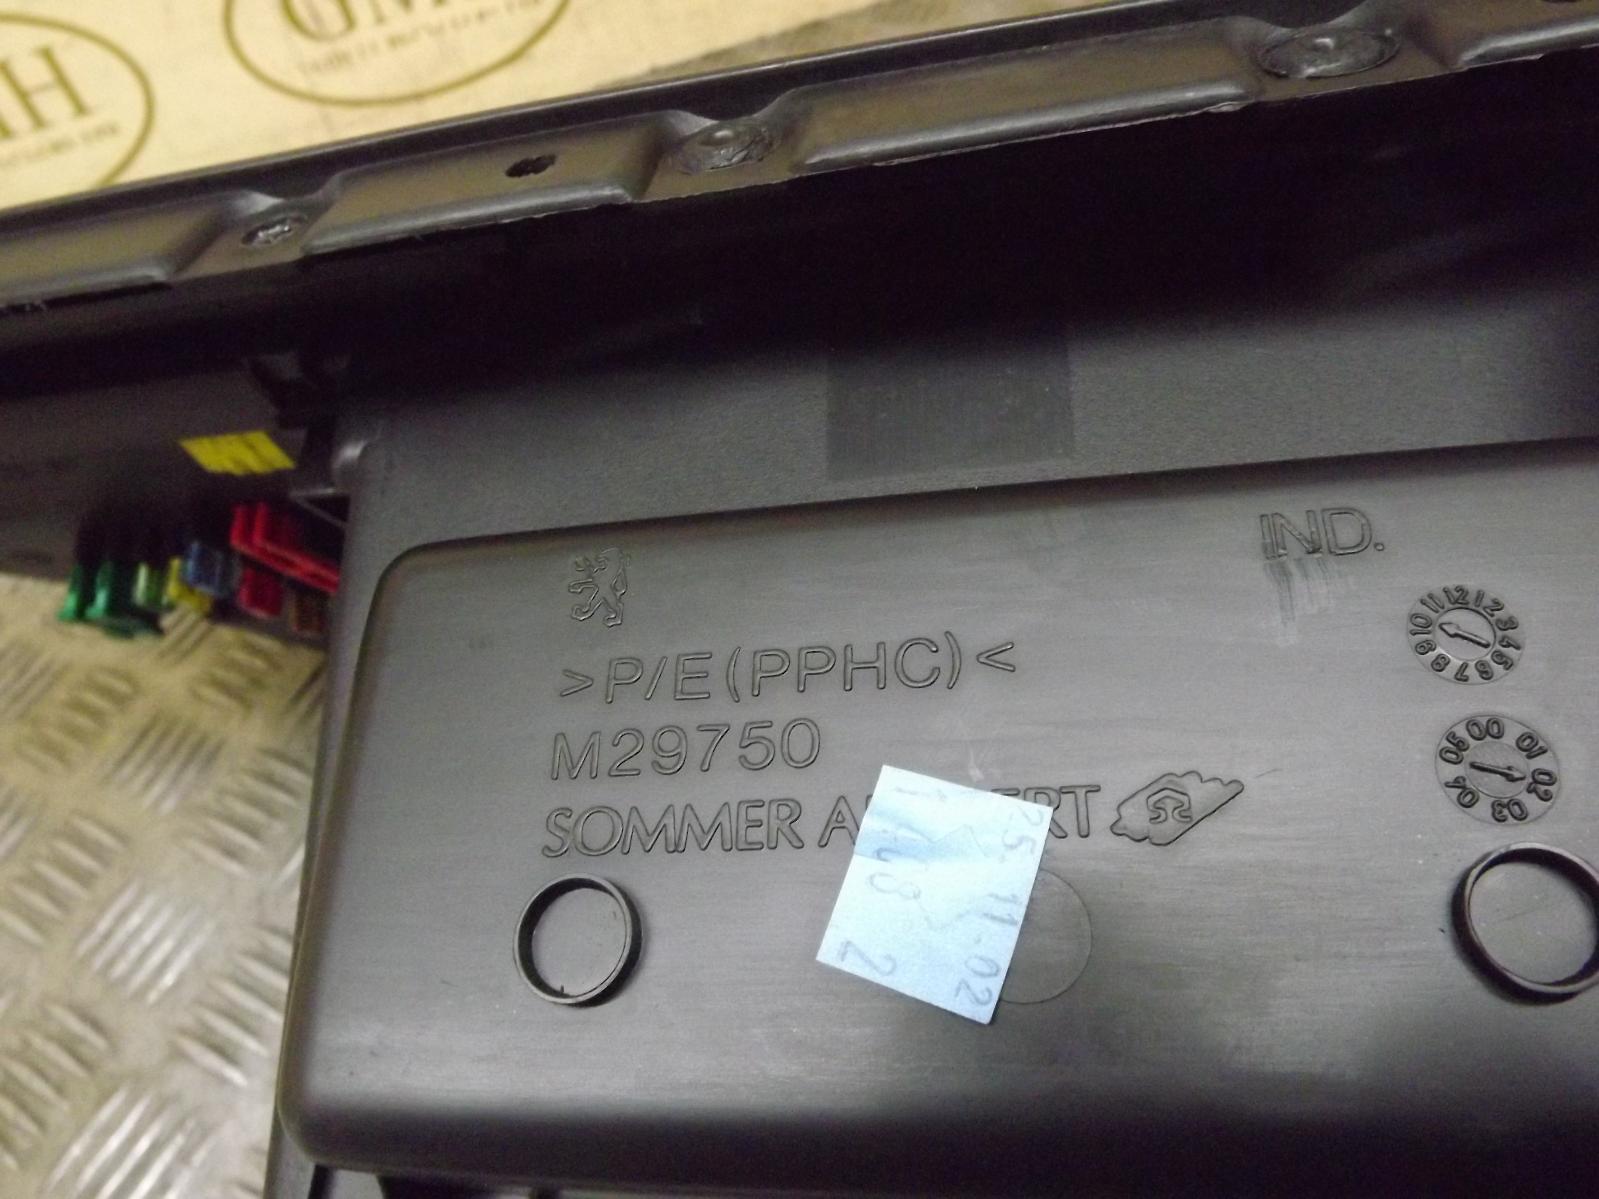 Peugeot 307 Glove Box Fuse Box : Peugeot glovebox glove box storage compartment